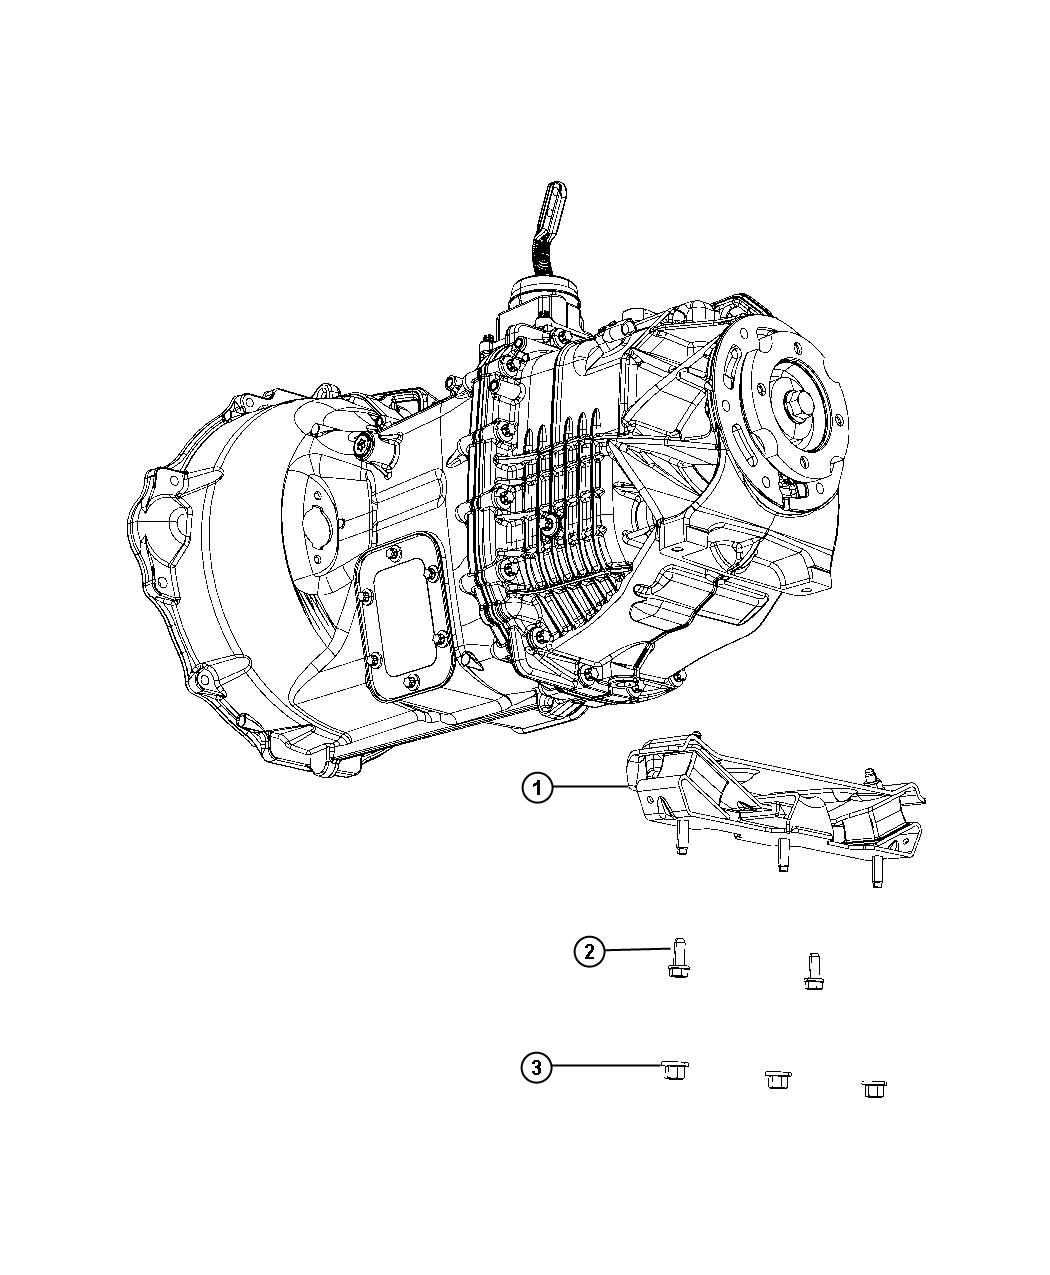 Dodge Ram Used For Bracket And Insulator